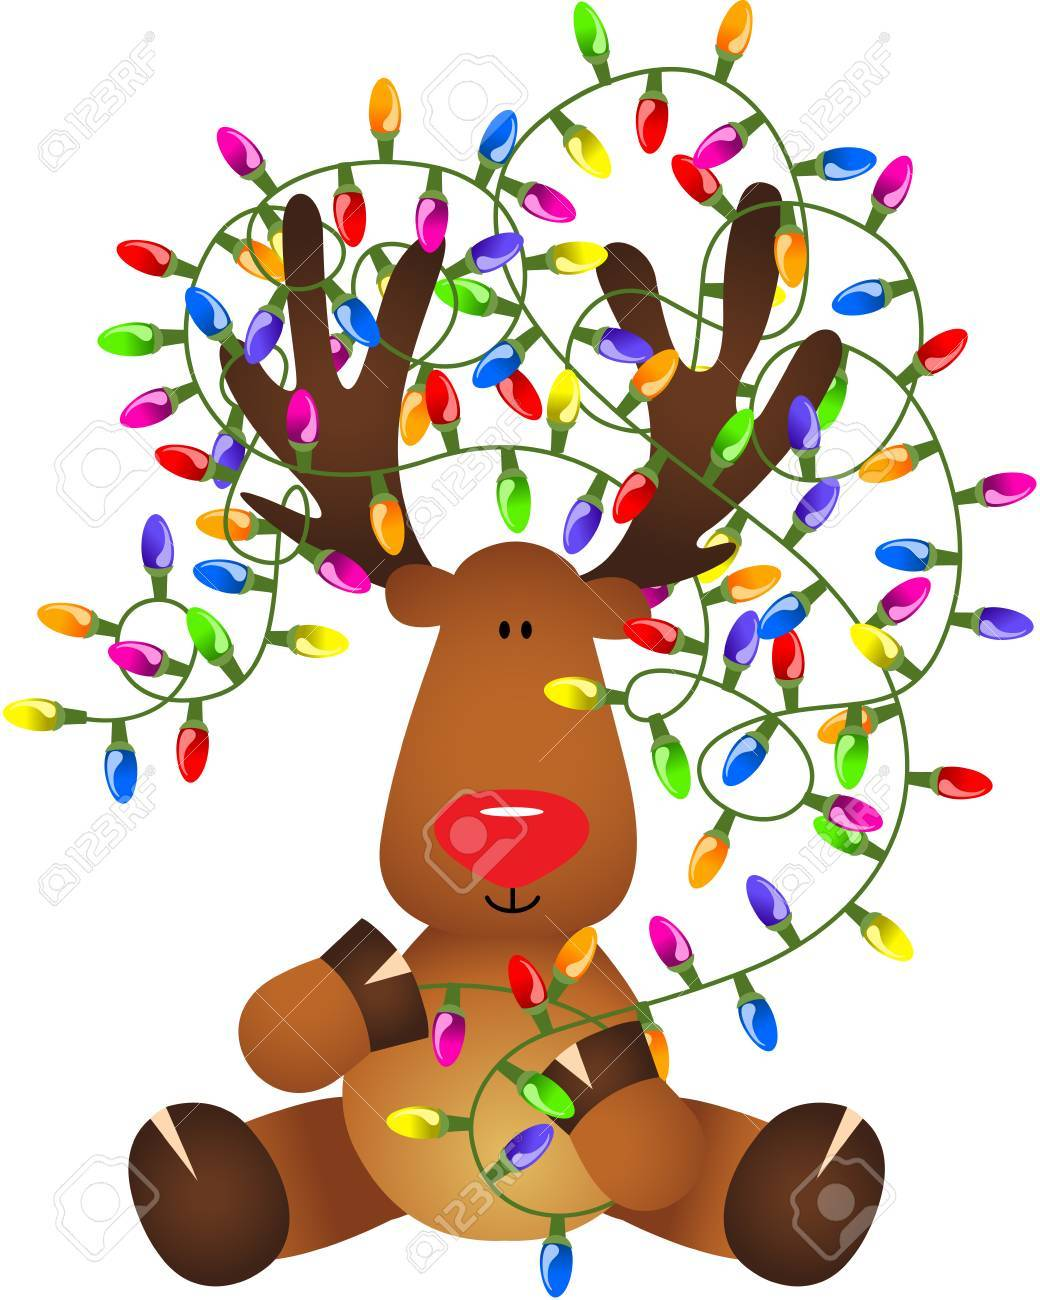 Cute Reindeer With Christmas Lights